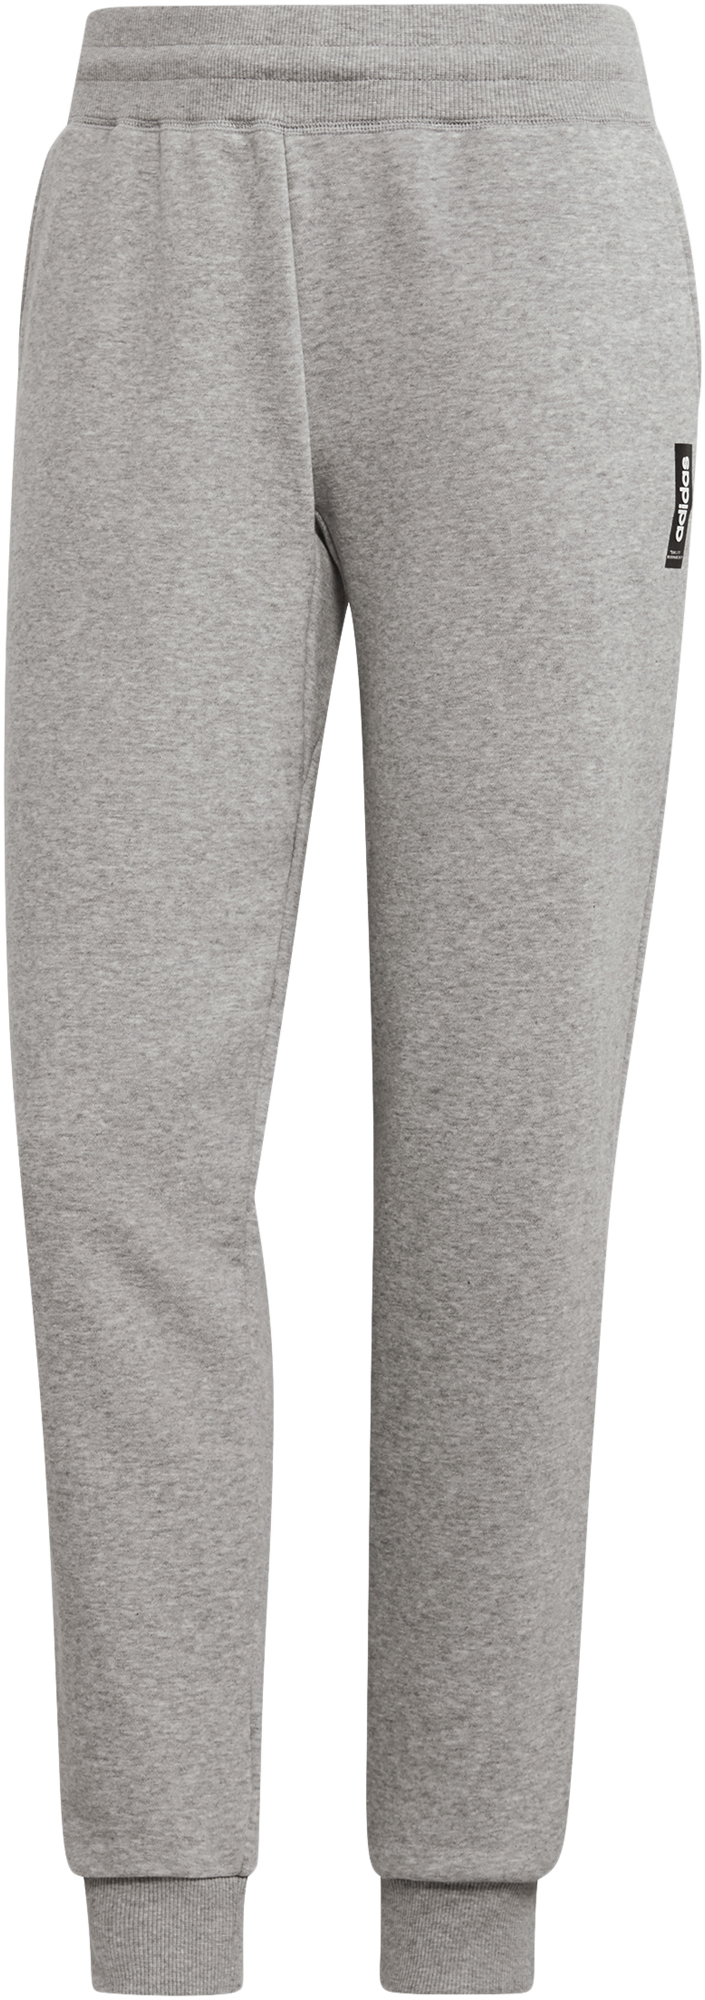 Adidas Брюки женские Brilliant Basics, размер 50-52